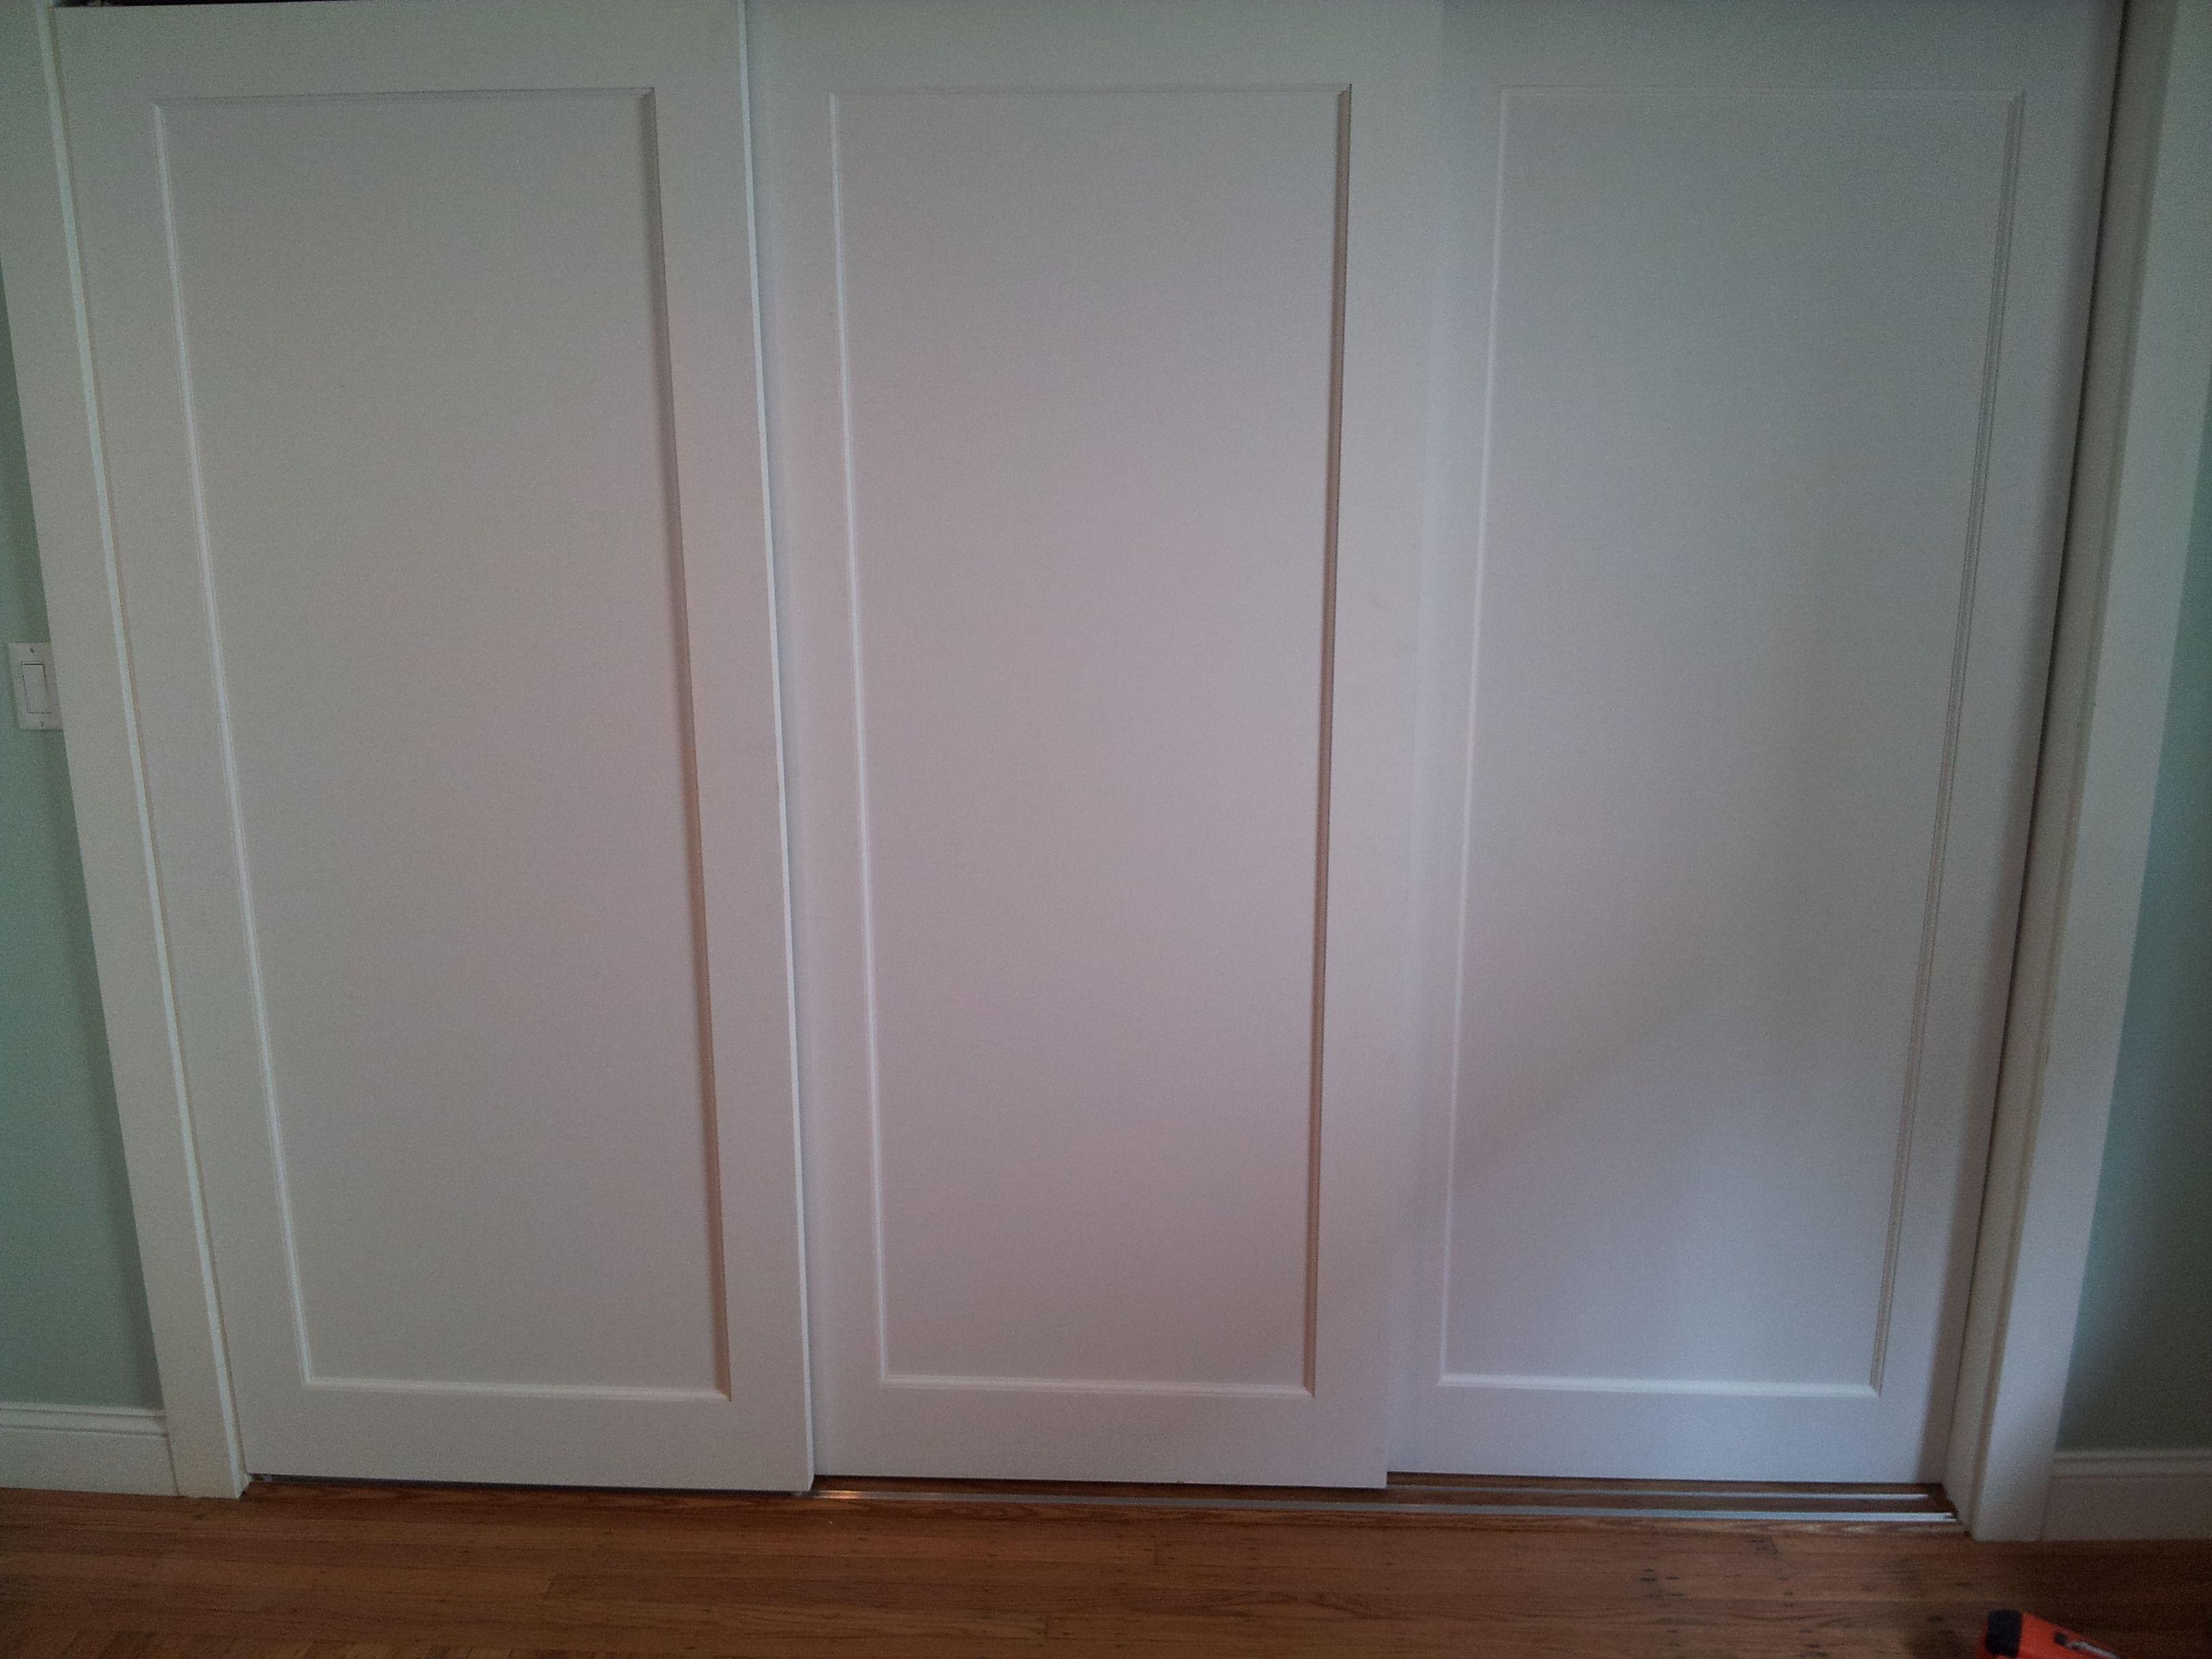 Three Panel Sliding Closet Doors Sliding Mirror Closet Doors Sliding Closet Doors Closet Door Track